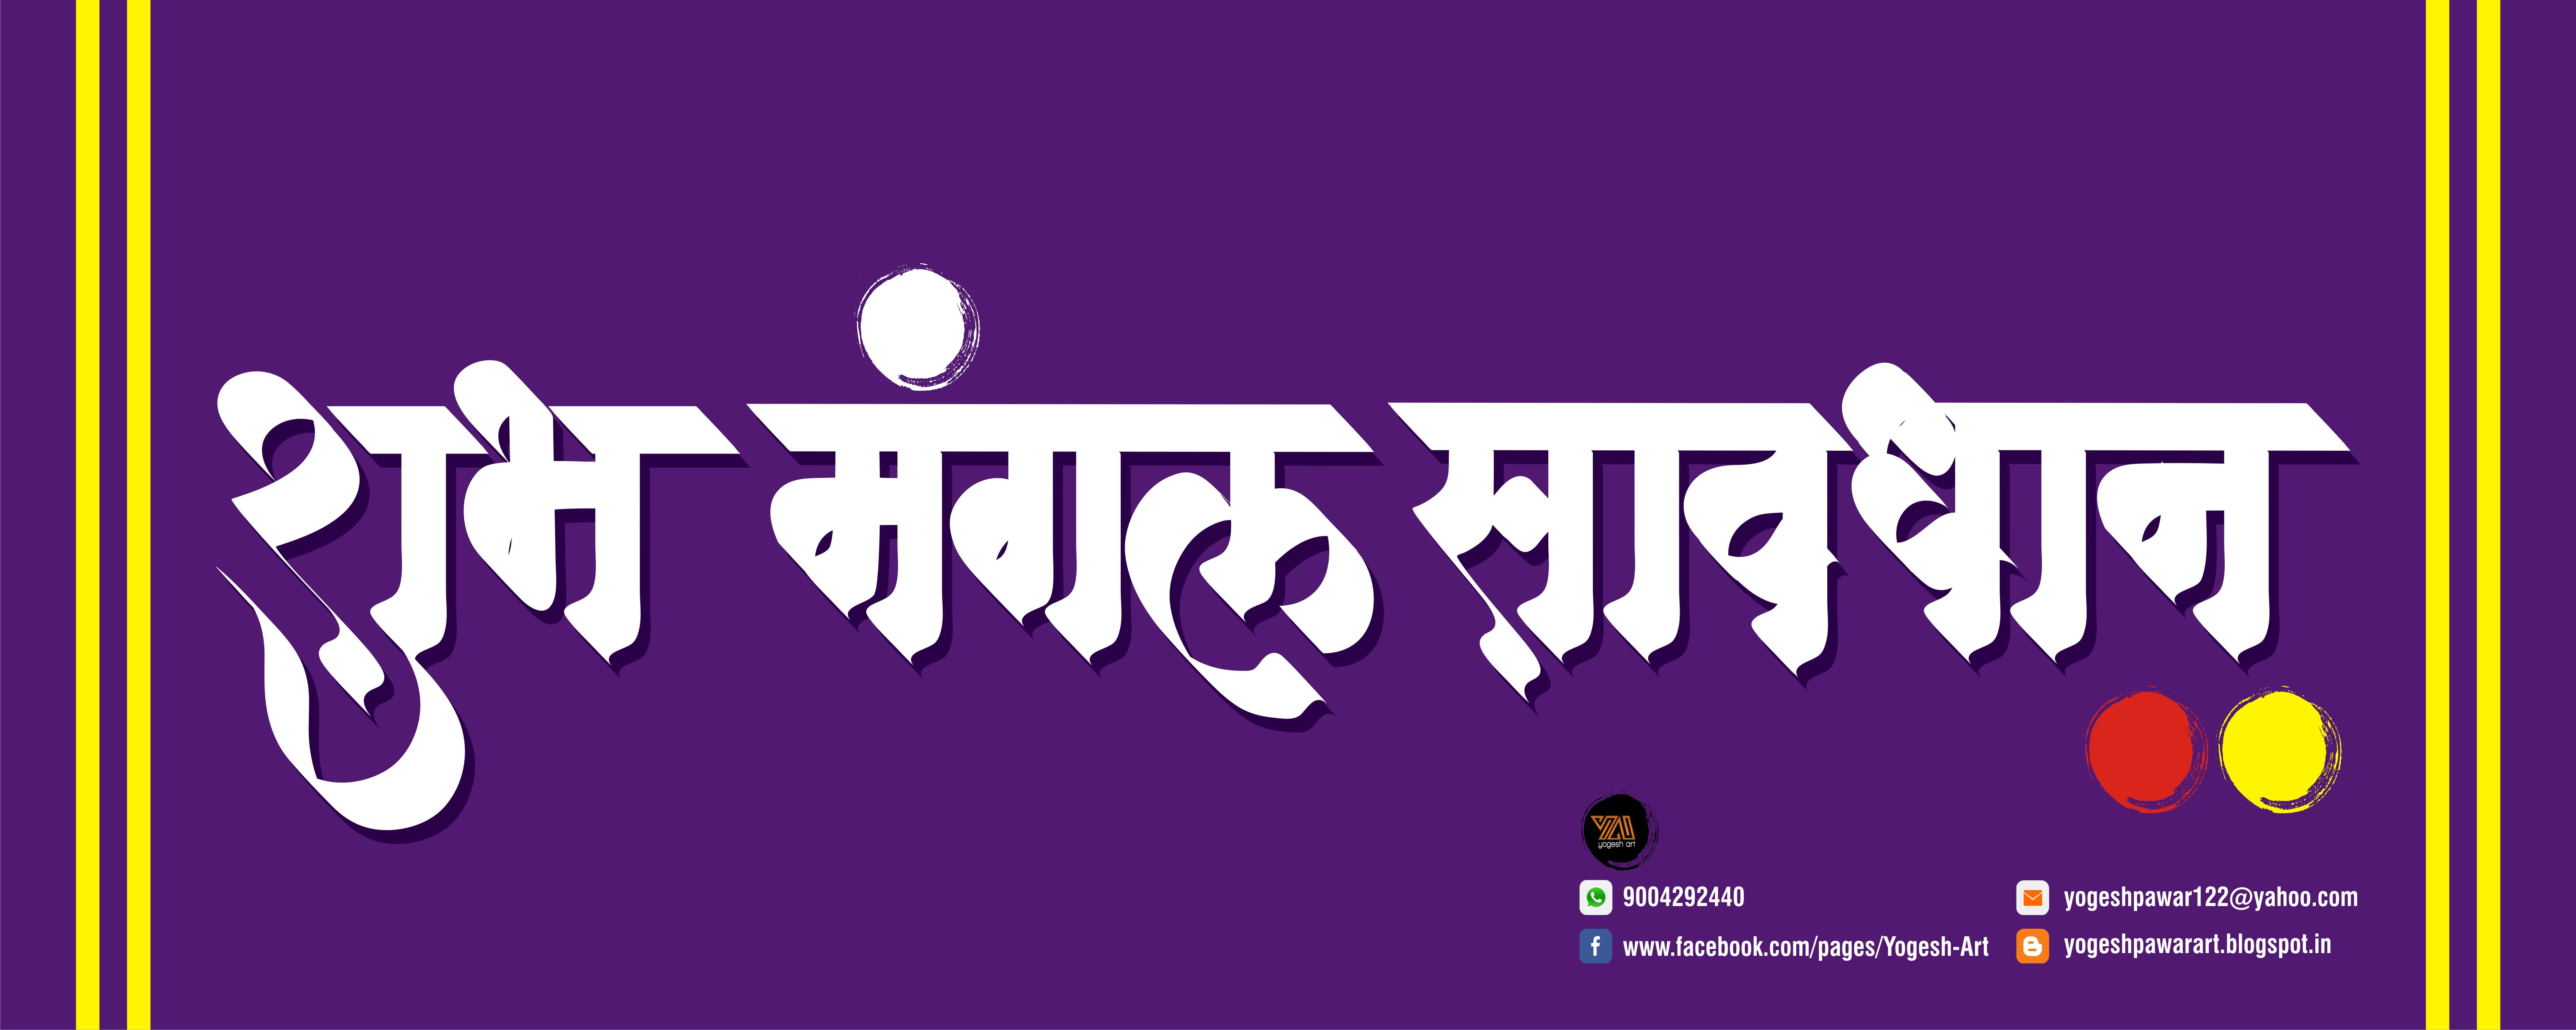 Marathi calligraphy letters